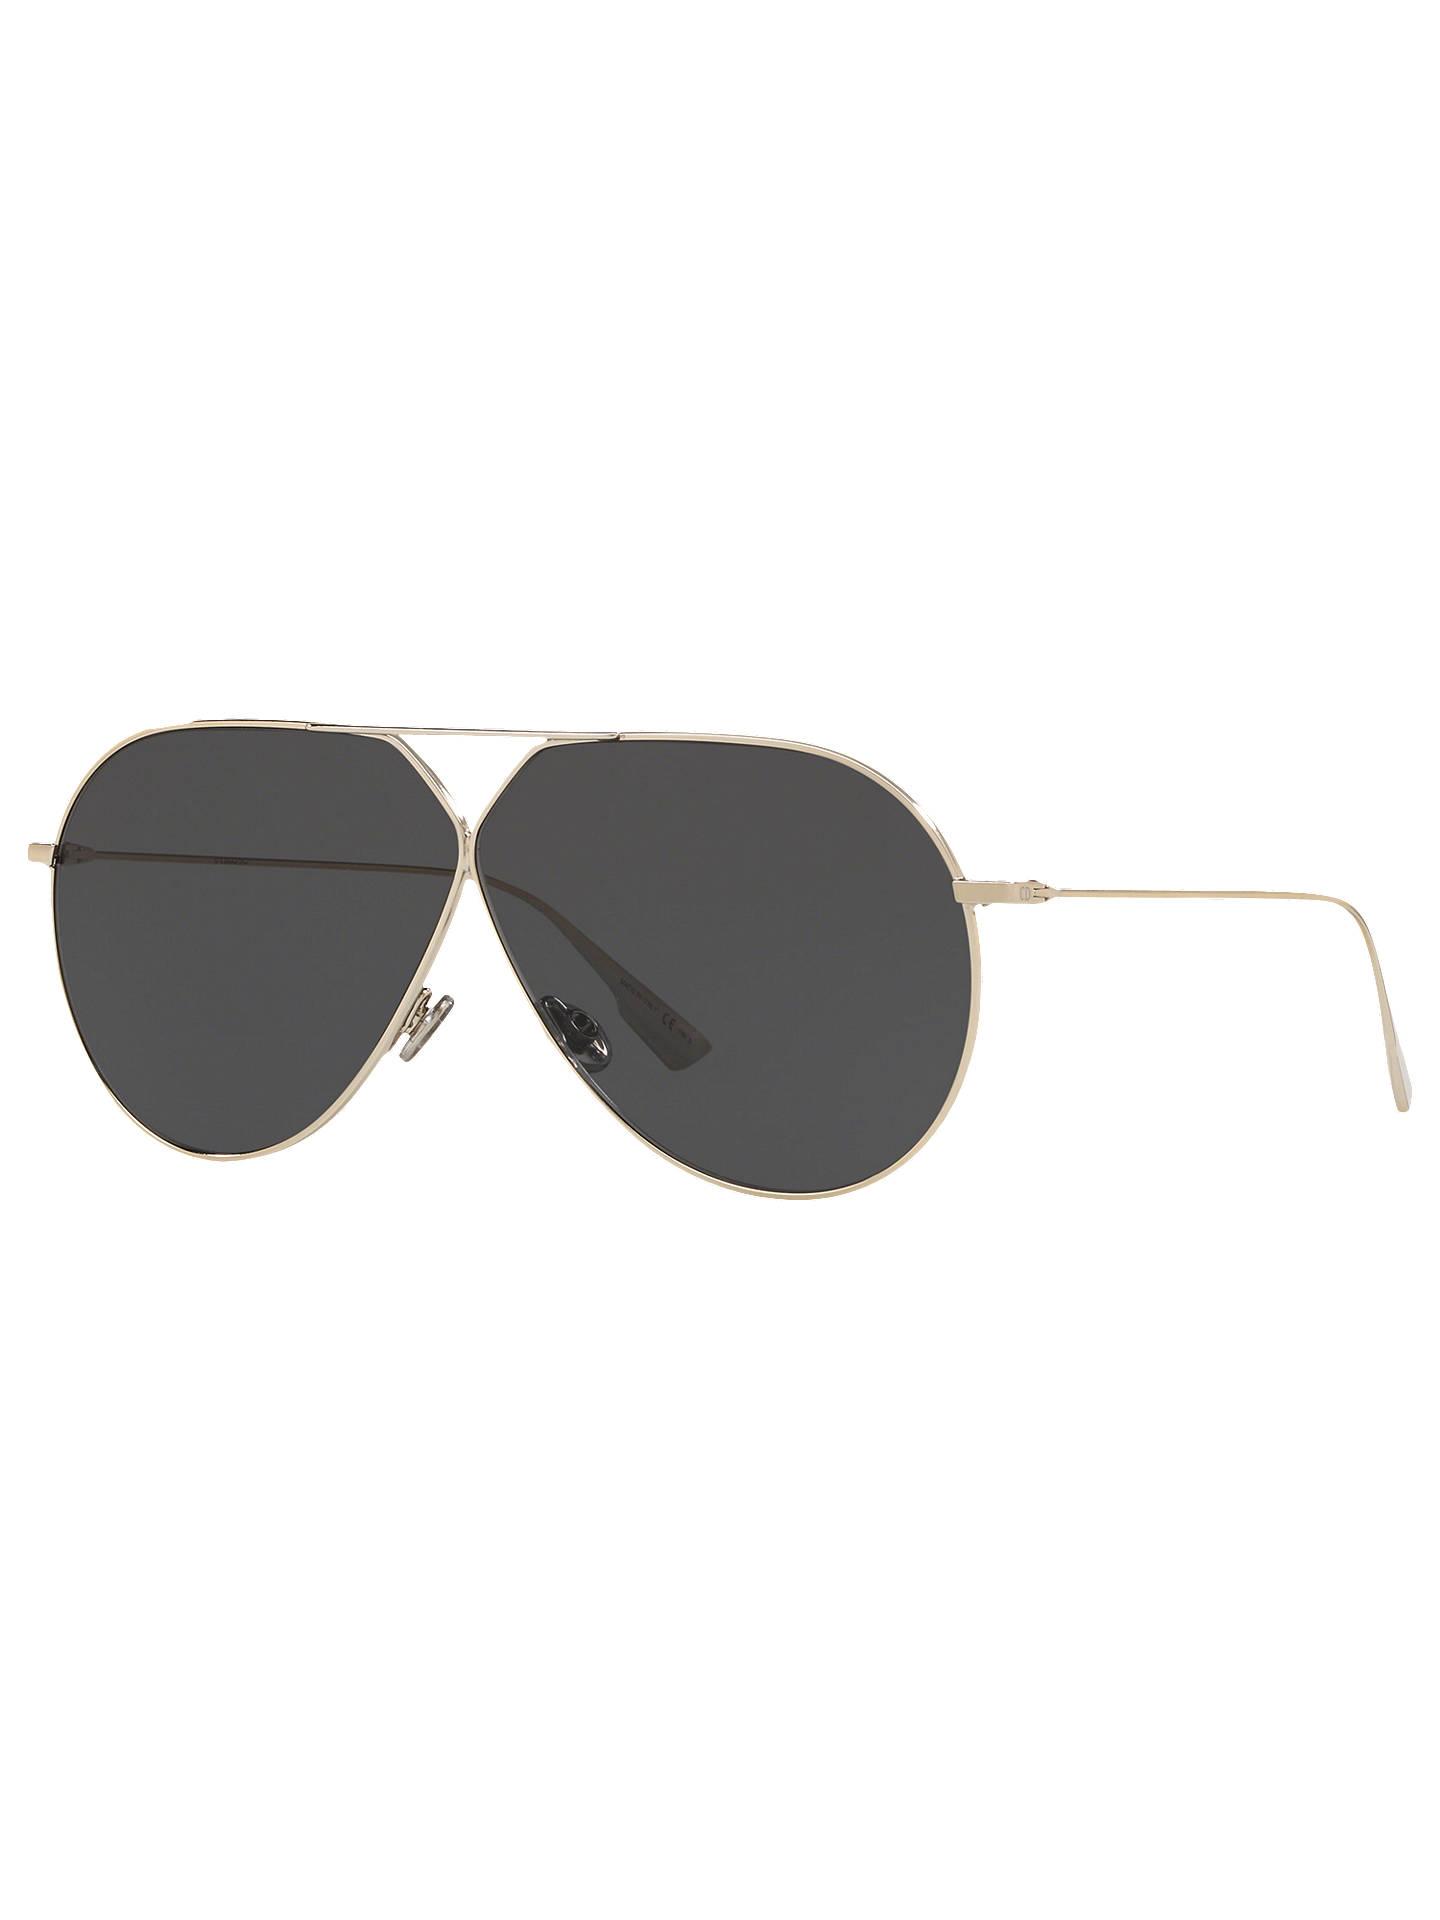 f7d524e63a30 Buy Dior DiorStellaire3 Women's Aviator Sunglasses, Gold/Gunmetal Online at  johnlewis. ...